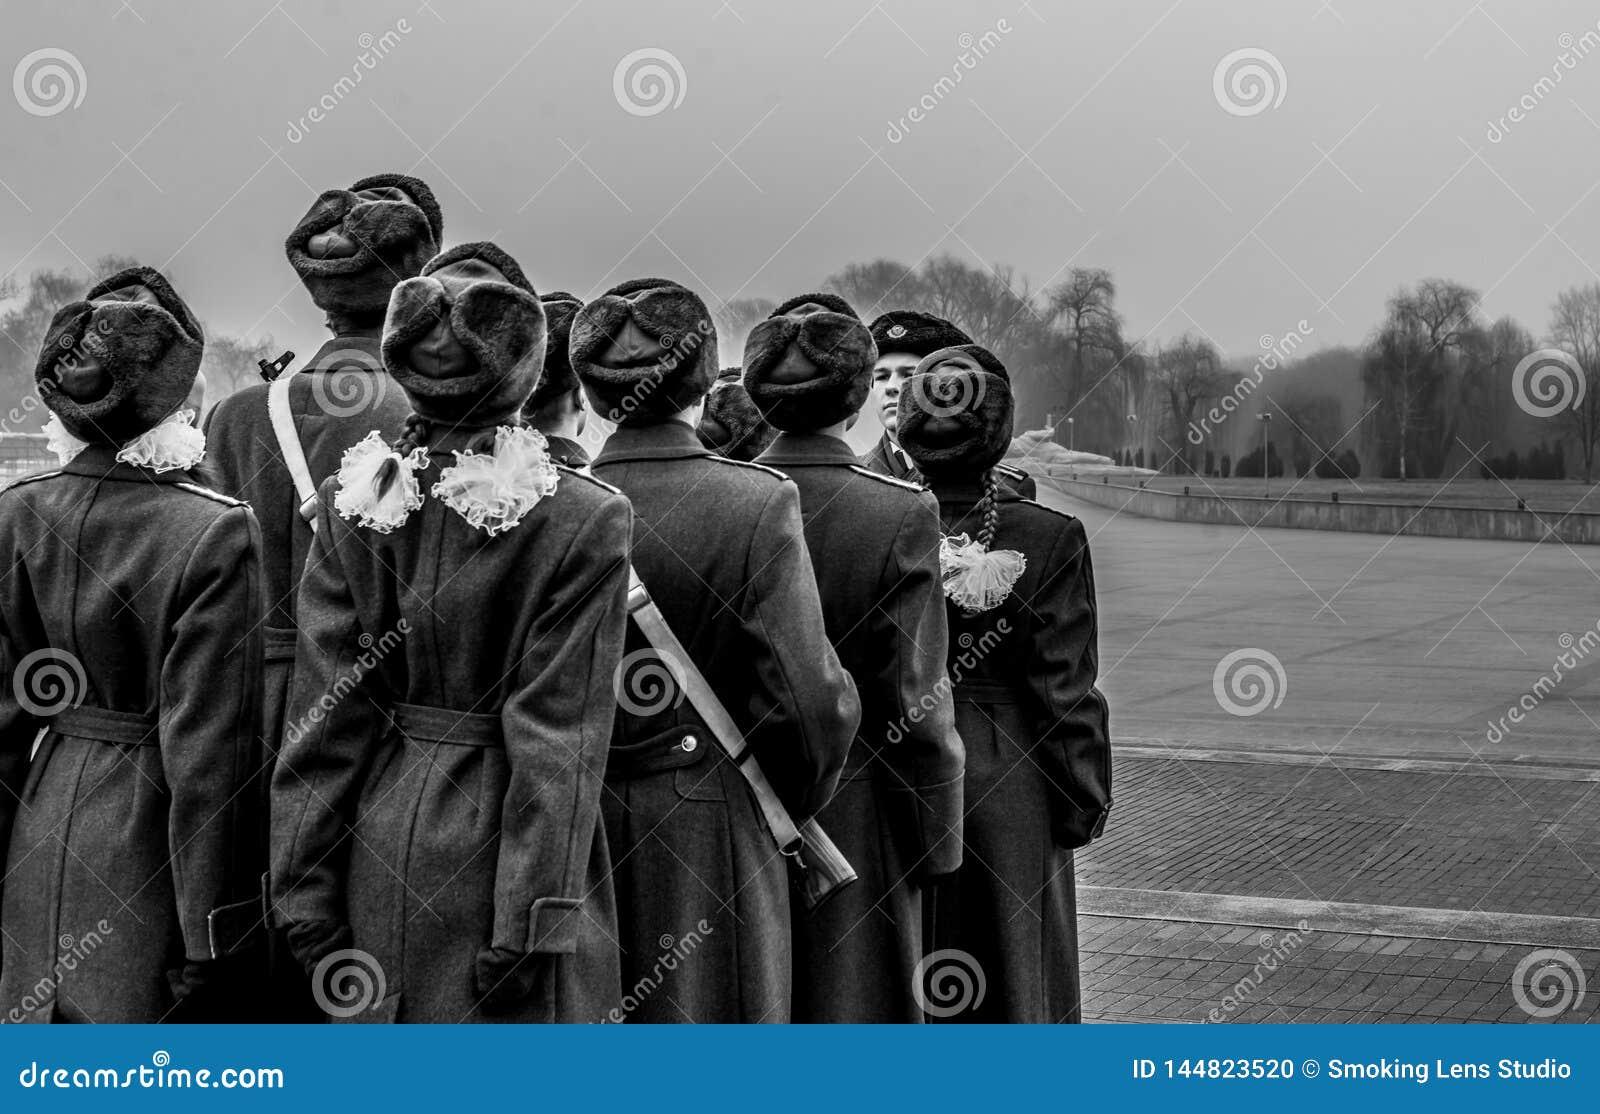 Студенты и солдаты маршируя и оплачивая дань